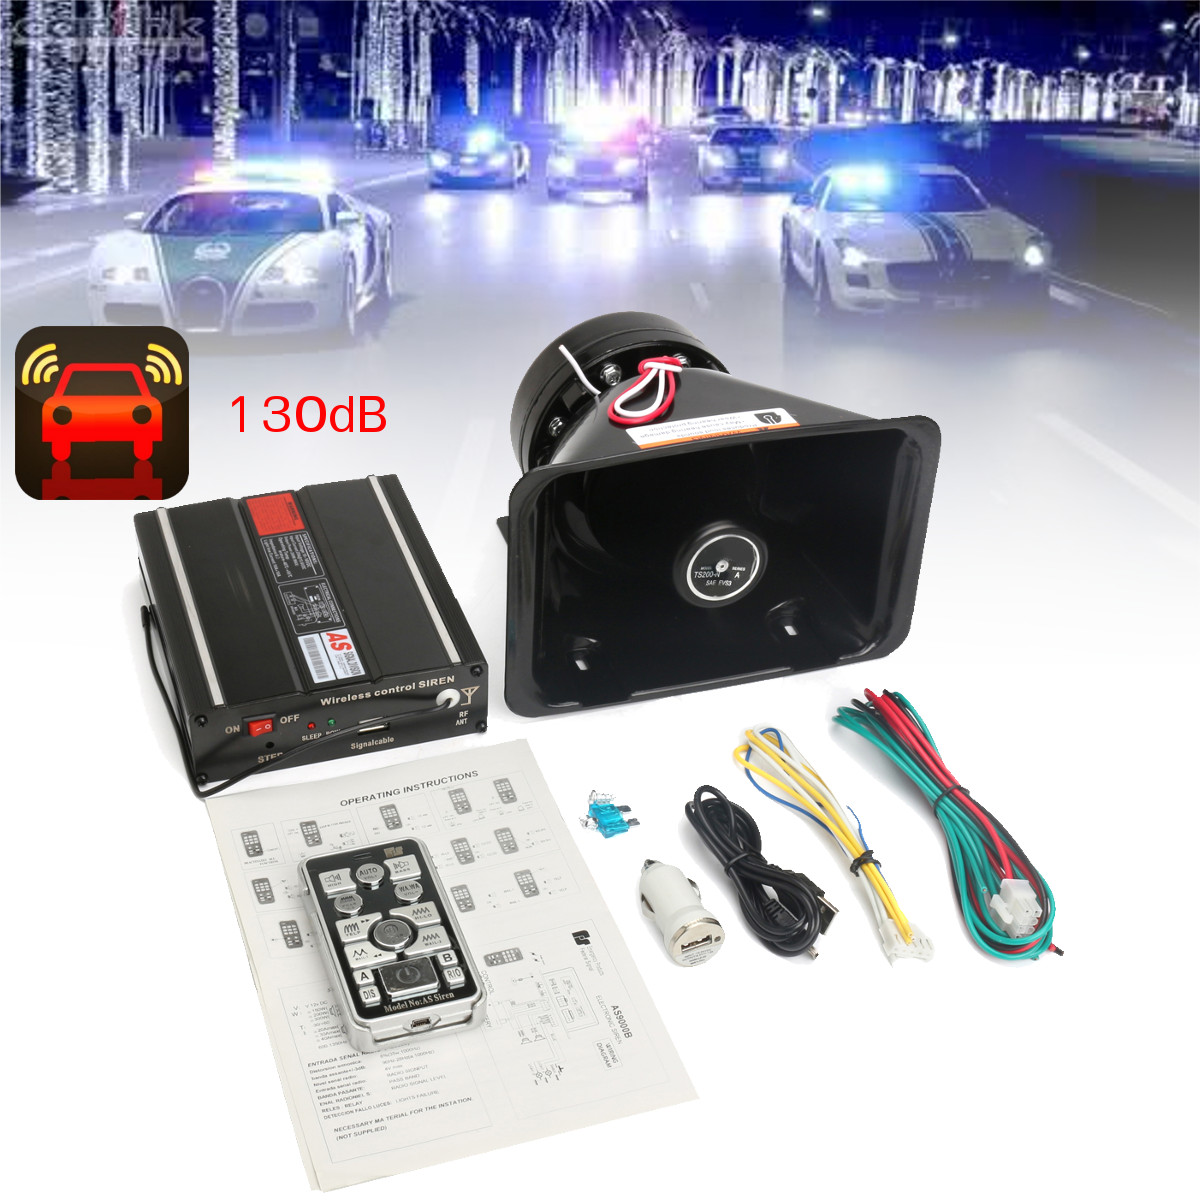 200w 8 Sound Car Horn Alarm Siren warn Remote Controll Ambulance Warning Loud speaker Vehicle Megaphone Emergency